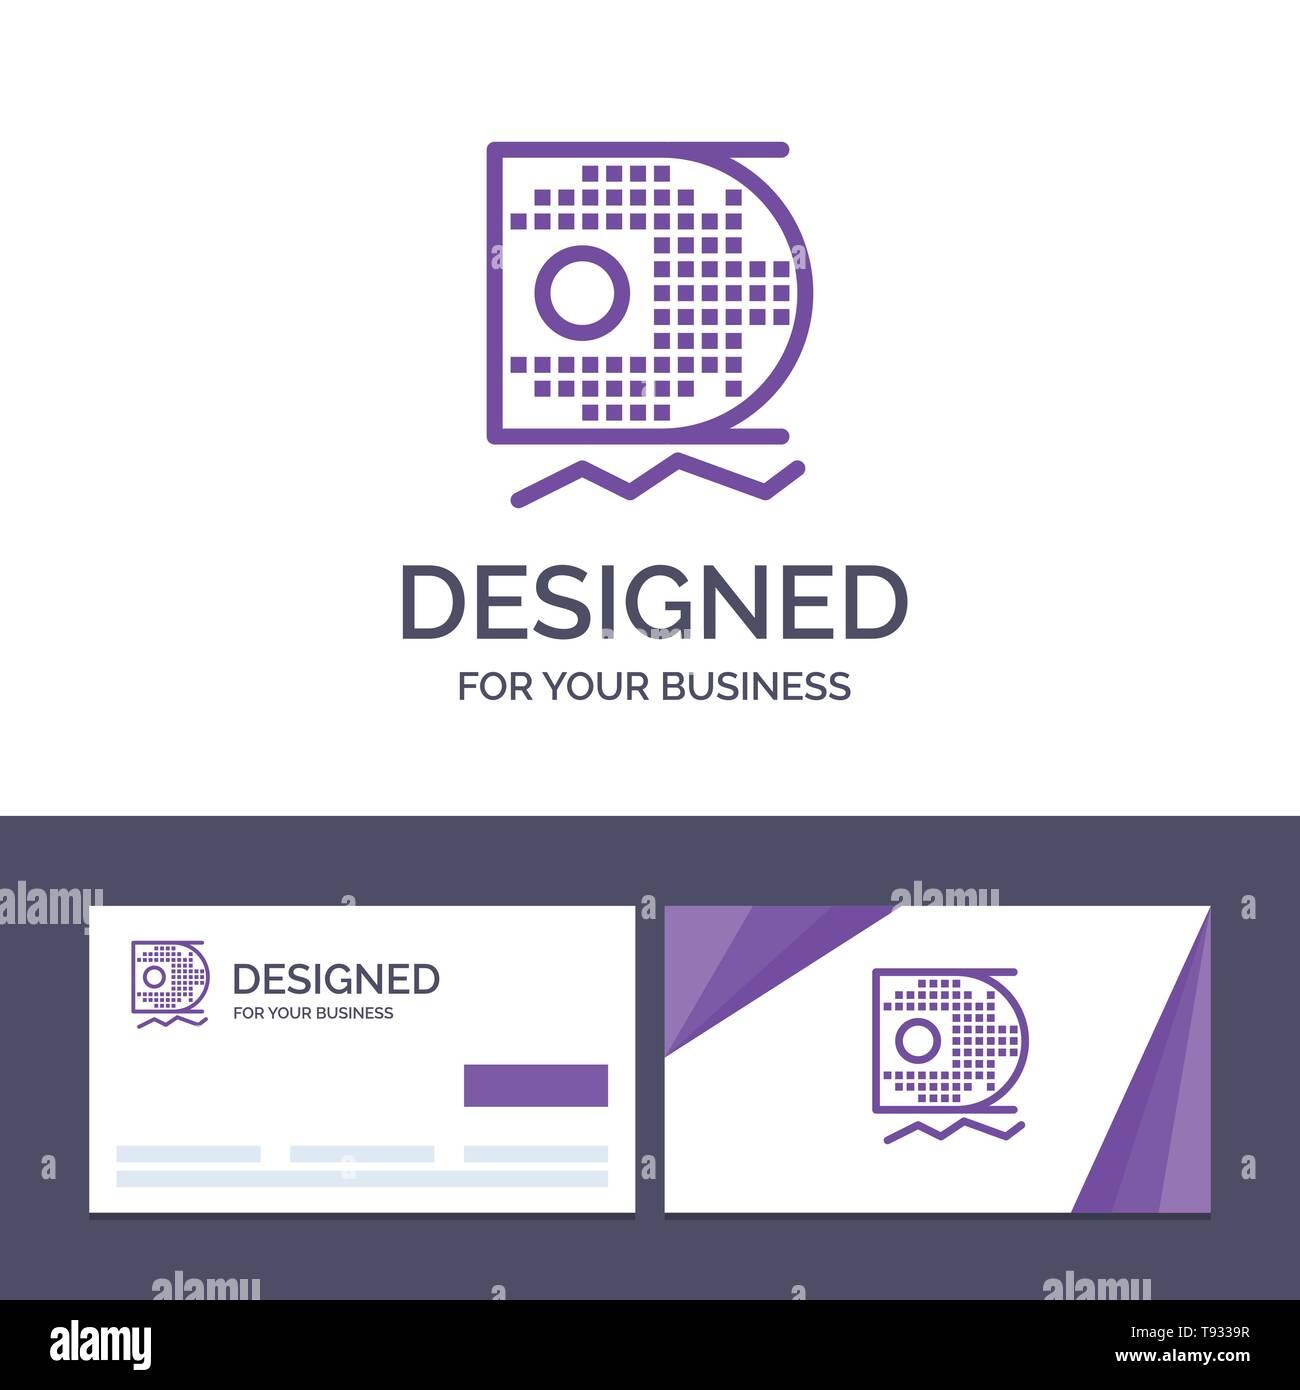 Creative Business Card und Logo template Daten, Wissenschaft, Daten Wissenschaft, Bergbau Vector Illustration Stock Vektor